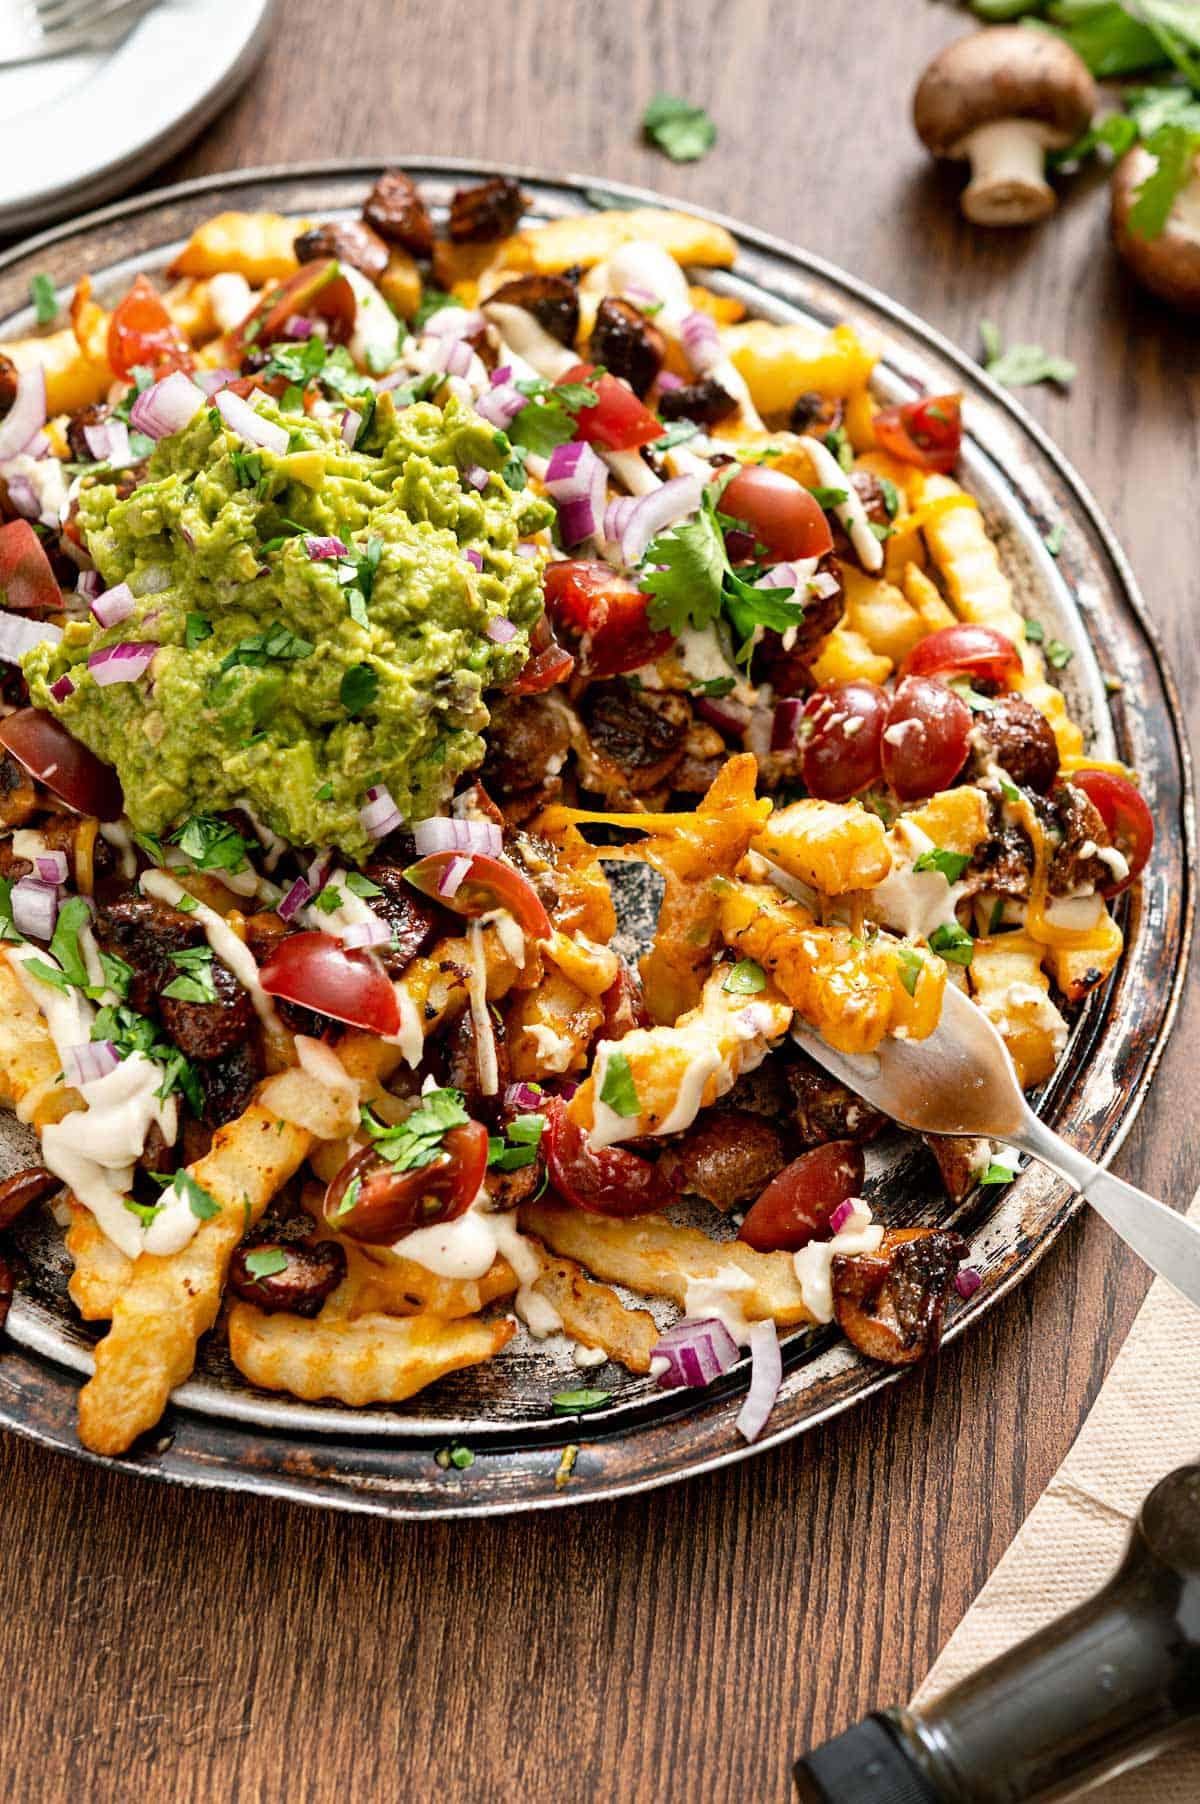 Close up shot of a platter of vegan mushroom asado fries on a wood table